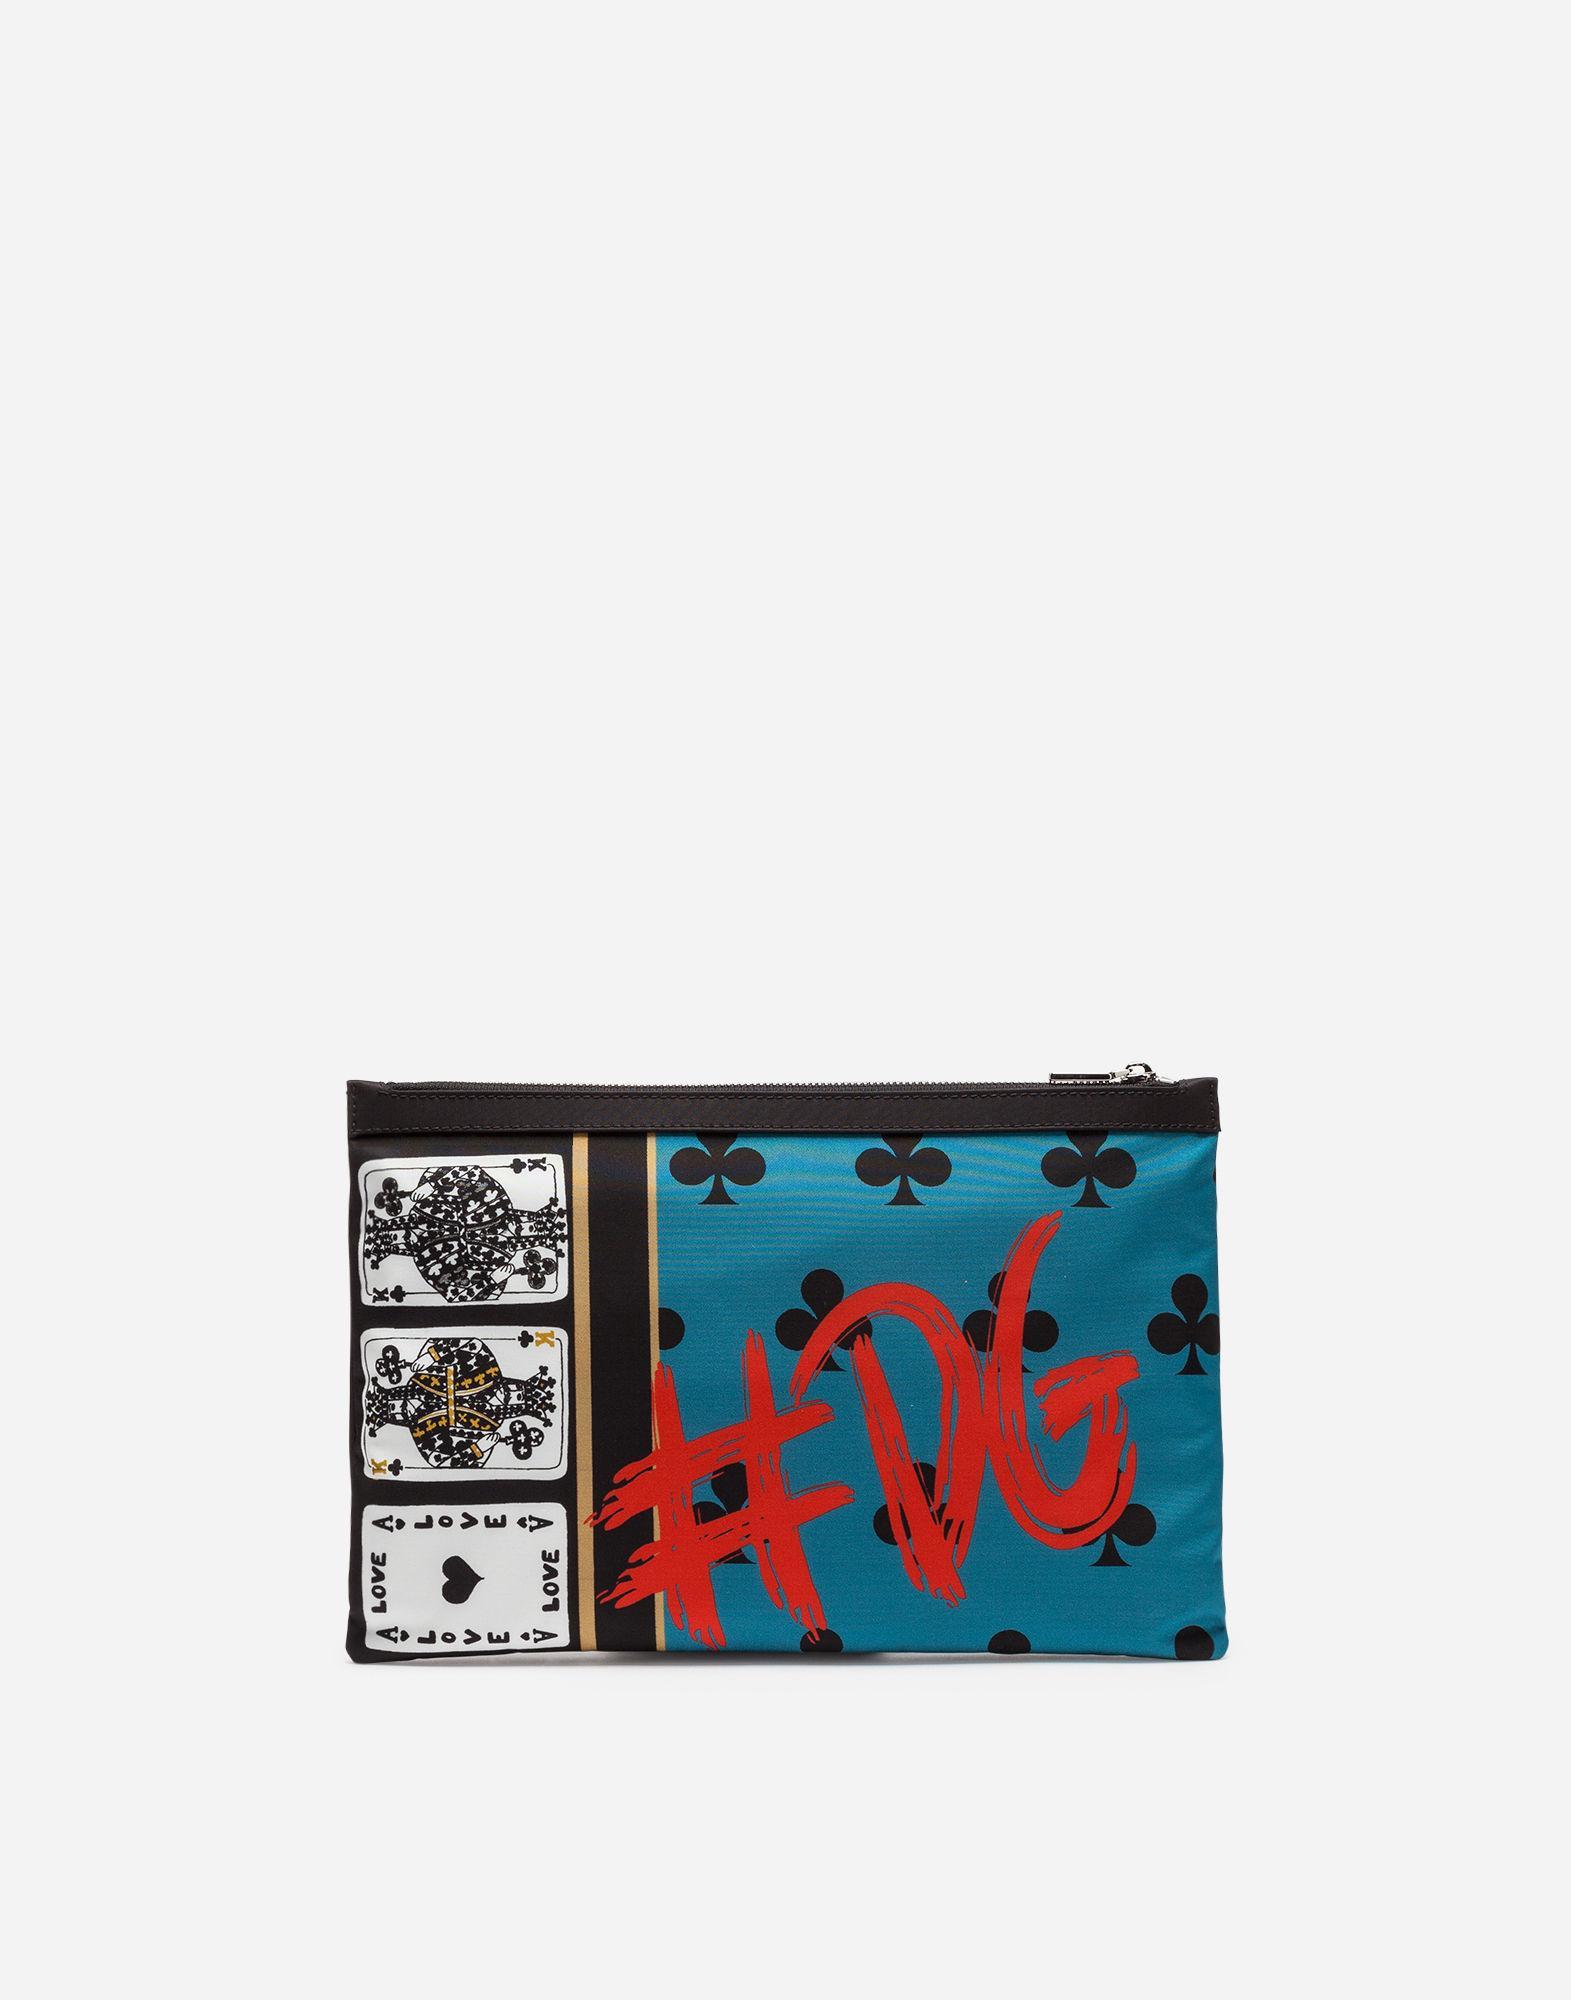 Dolce & Gabbana Printed Nylon Document Holder In Multicolor